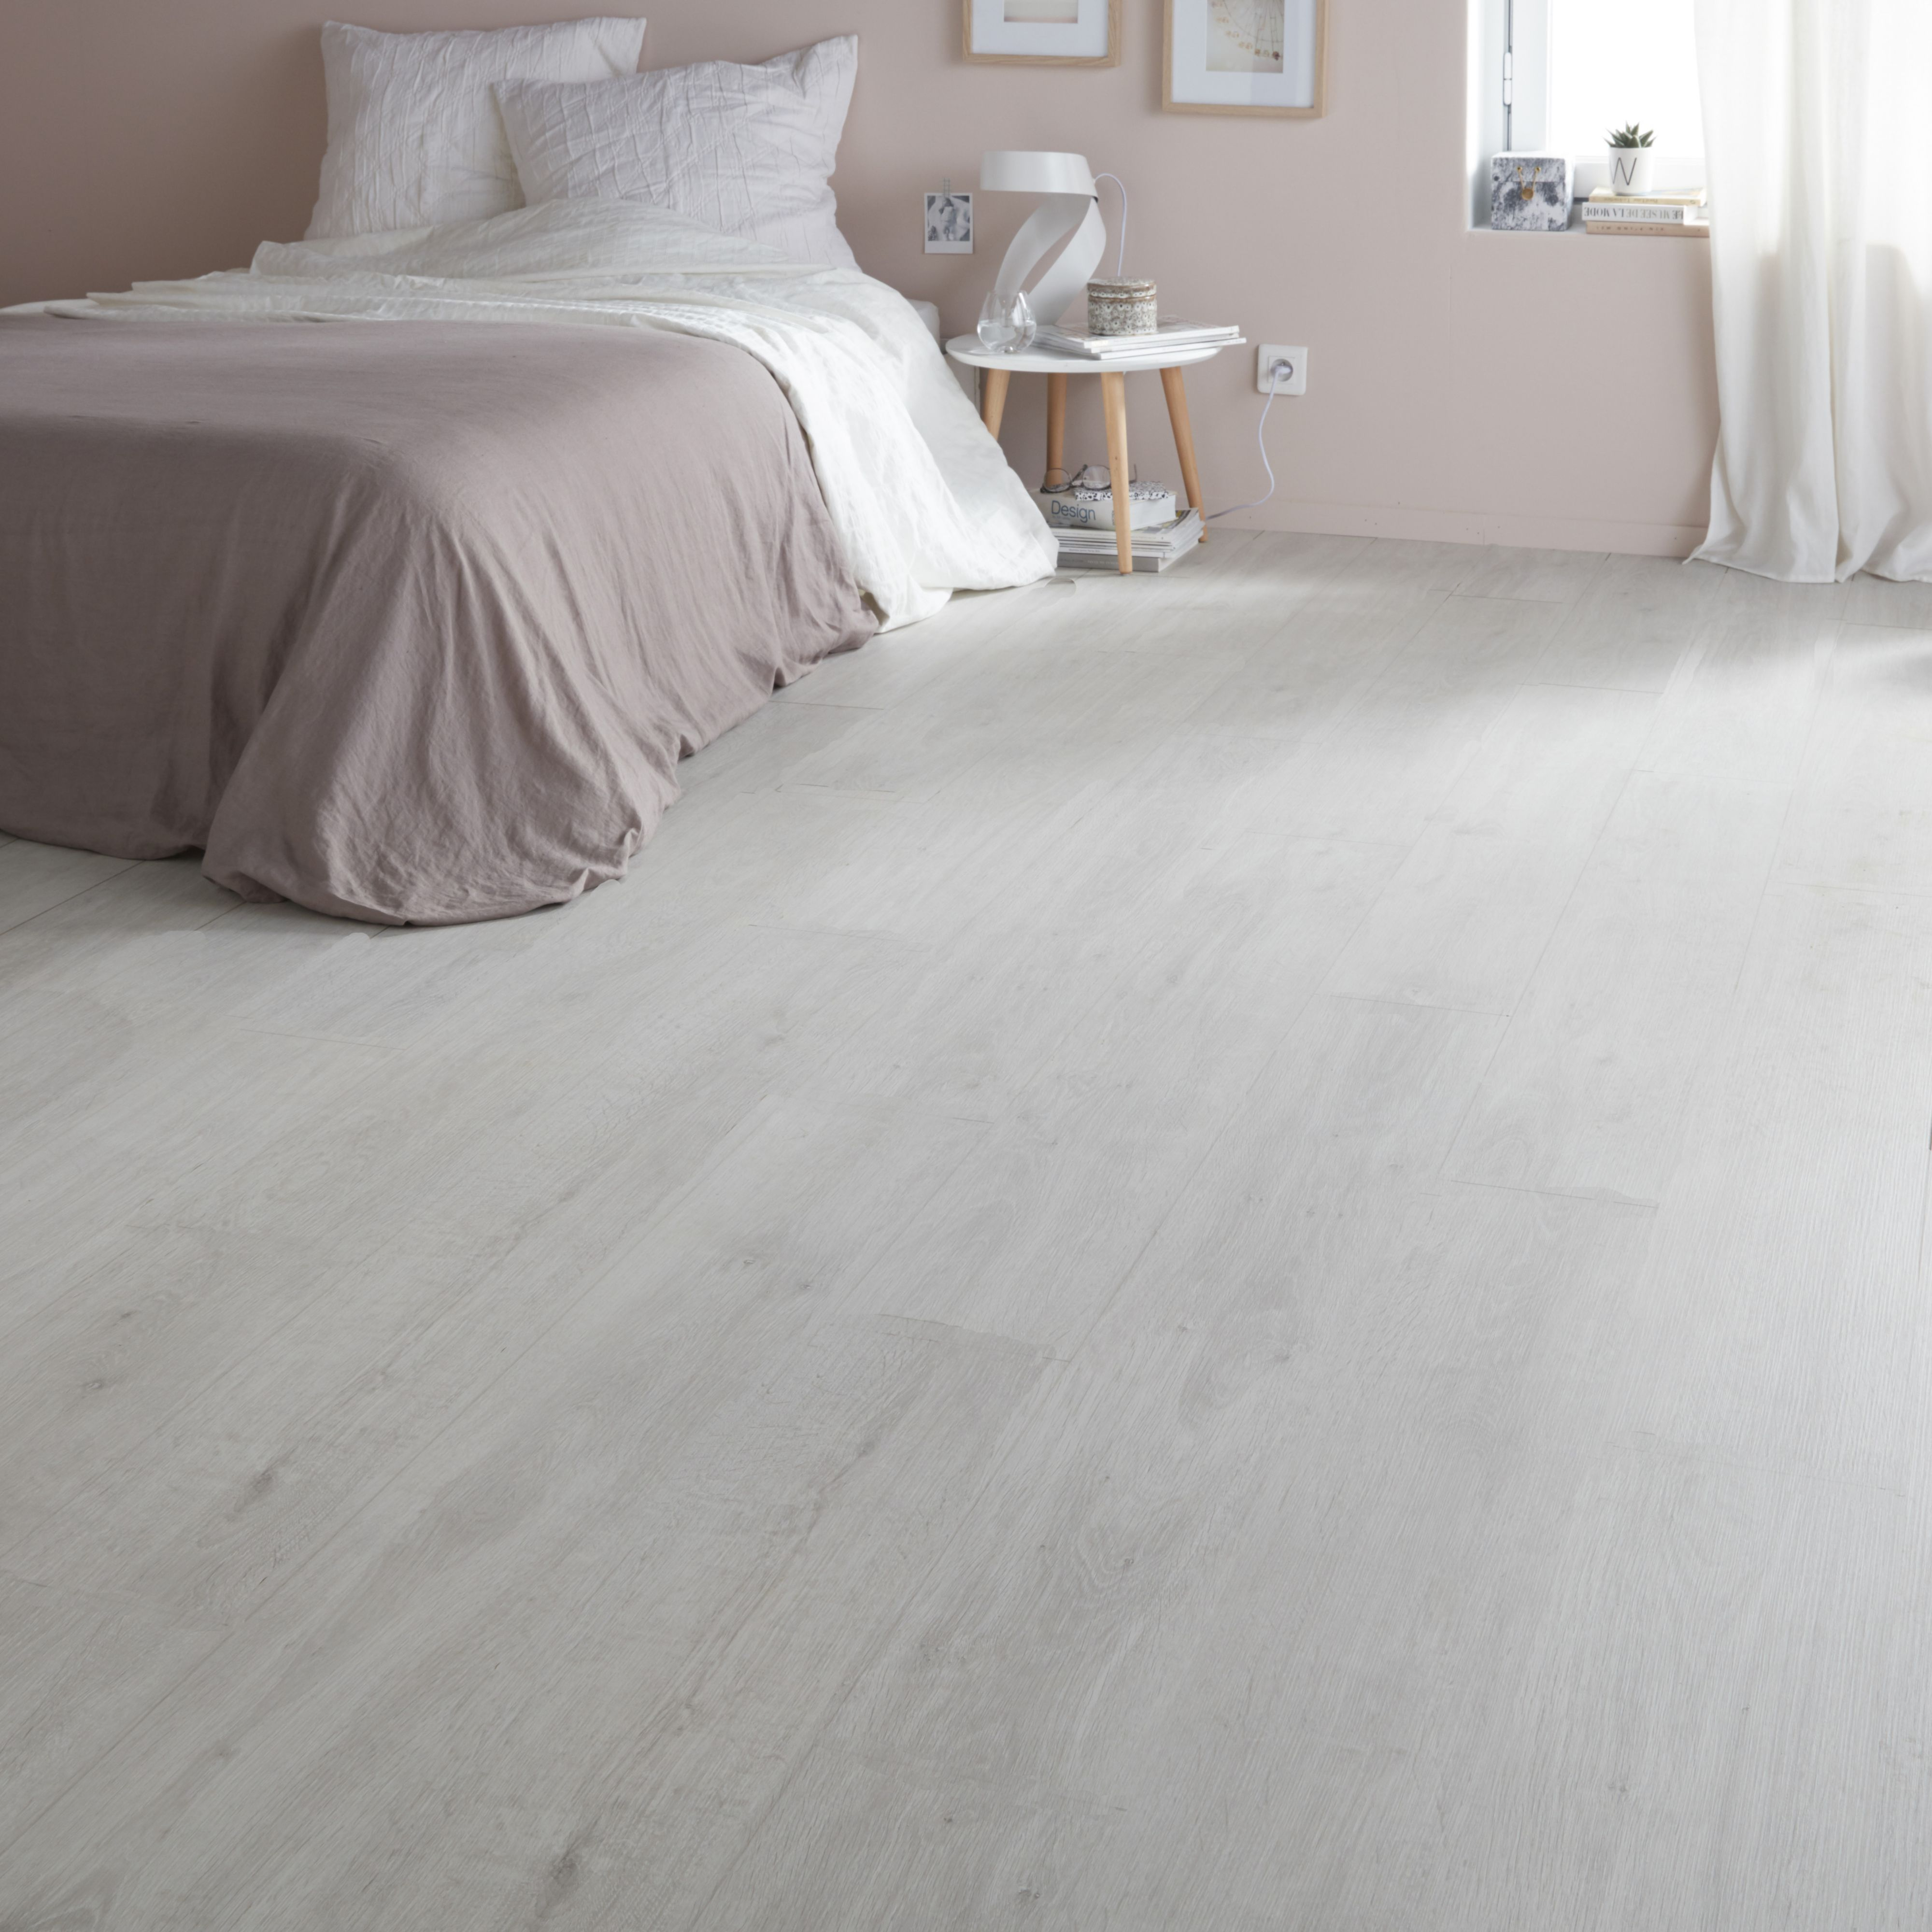 Geelong Grey Oak effect Laminate flooring 2467 m Pack  Departments  DIY at BQ